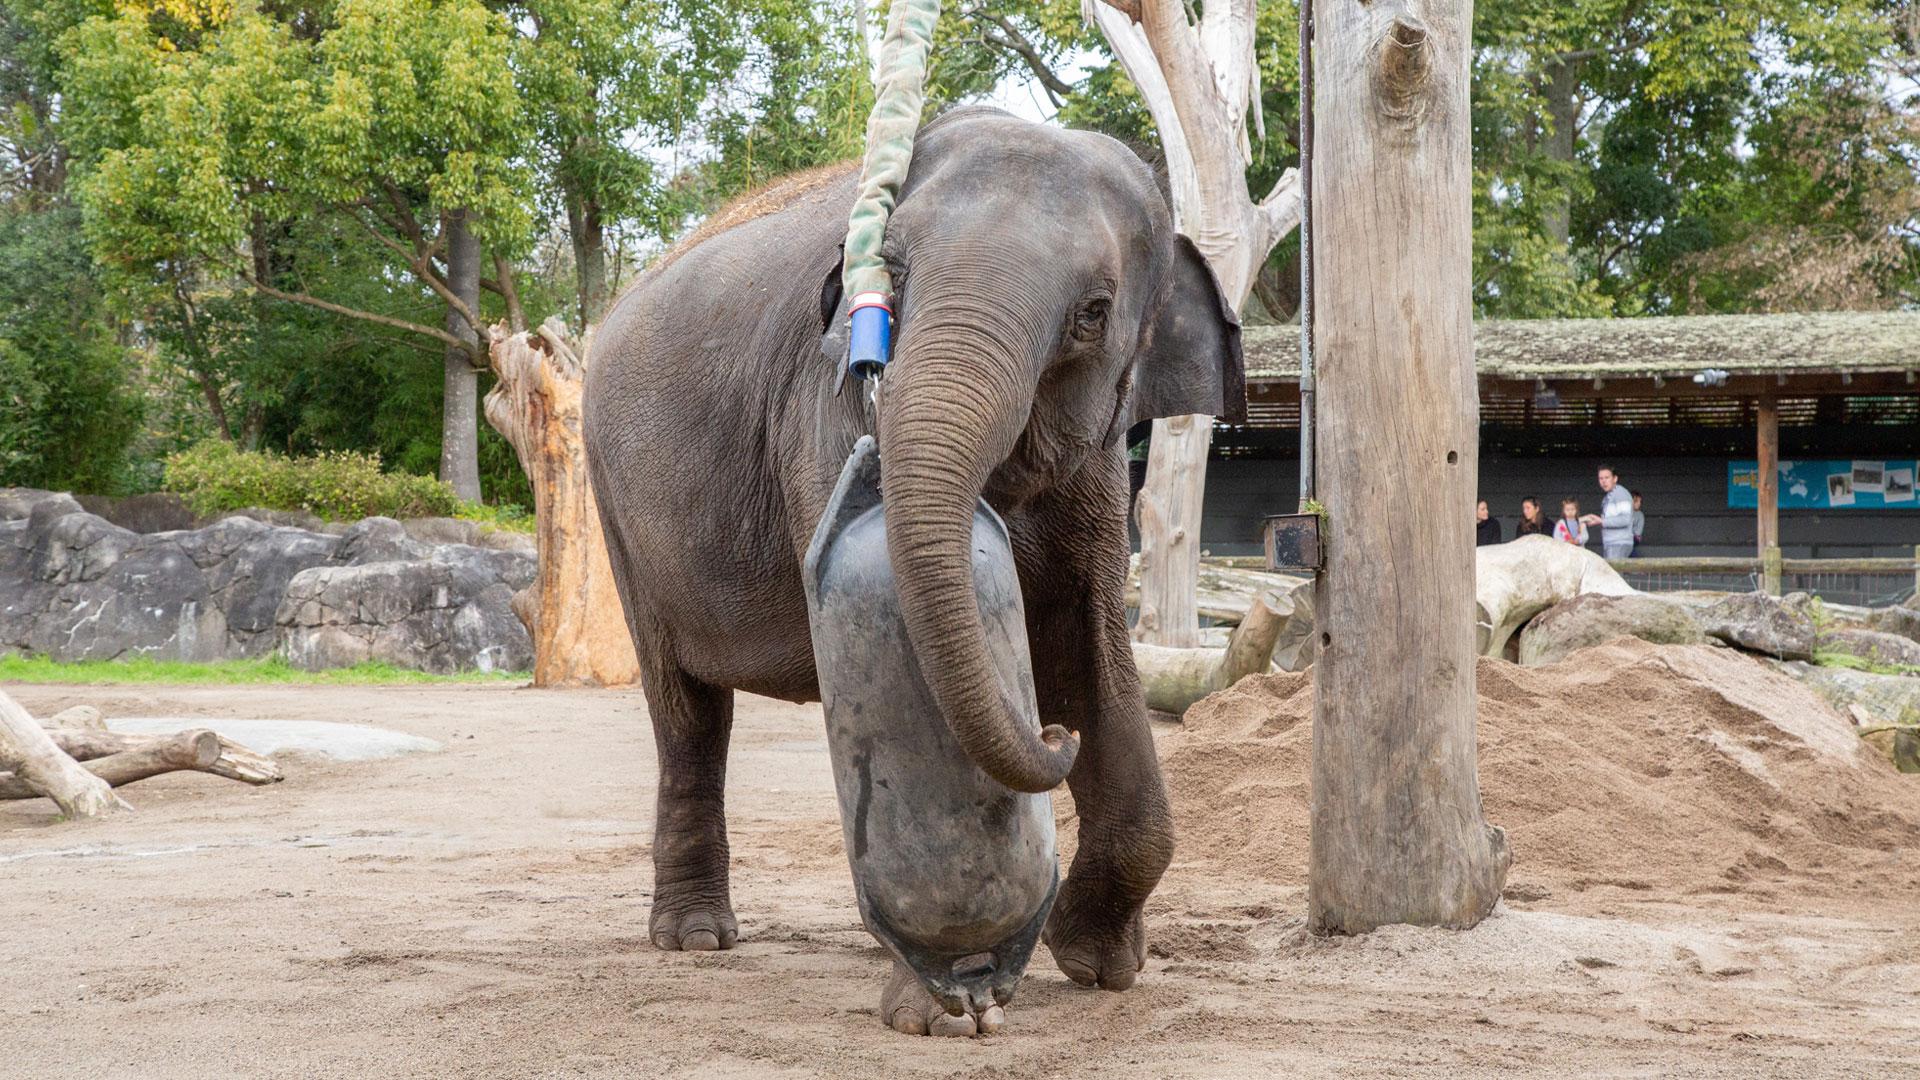 https://rfacdn.nz/zoo/assets/media/elephant-news-gallery-1.jpg